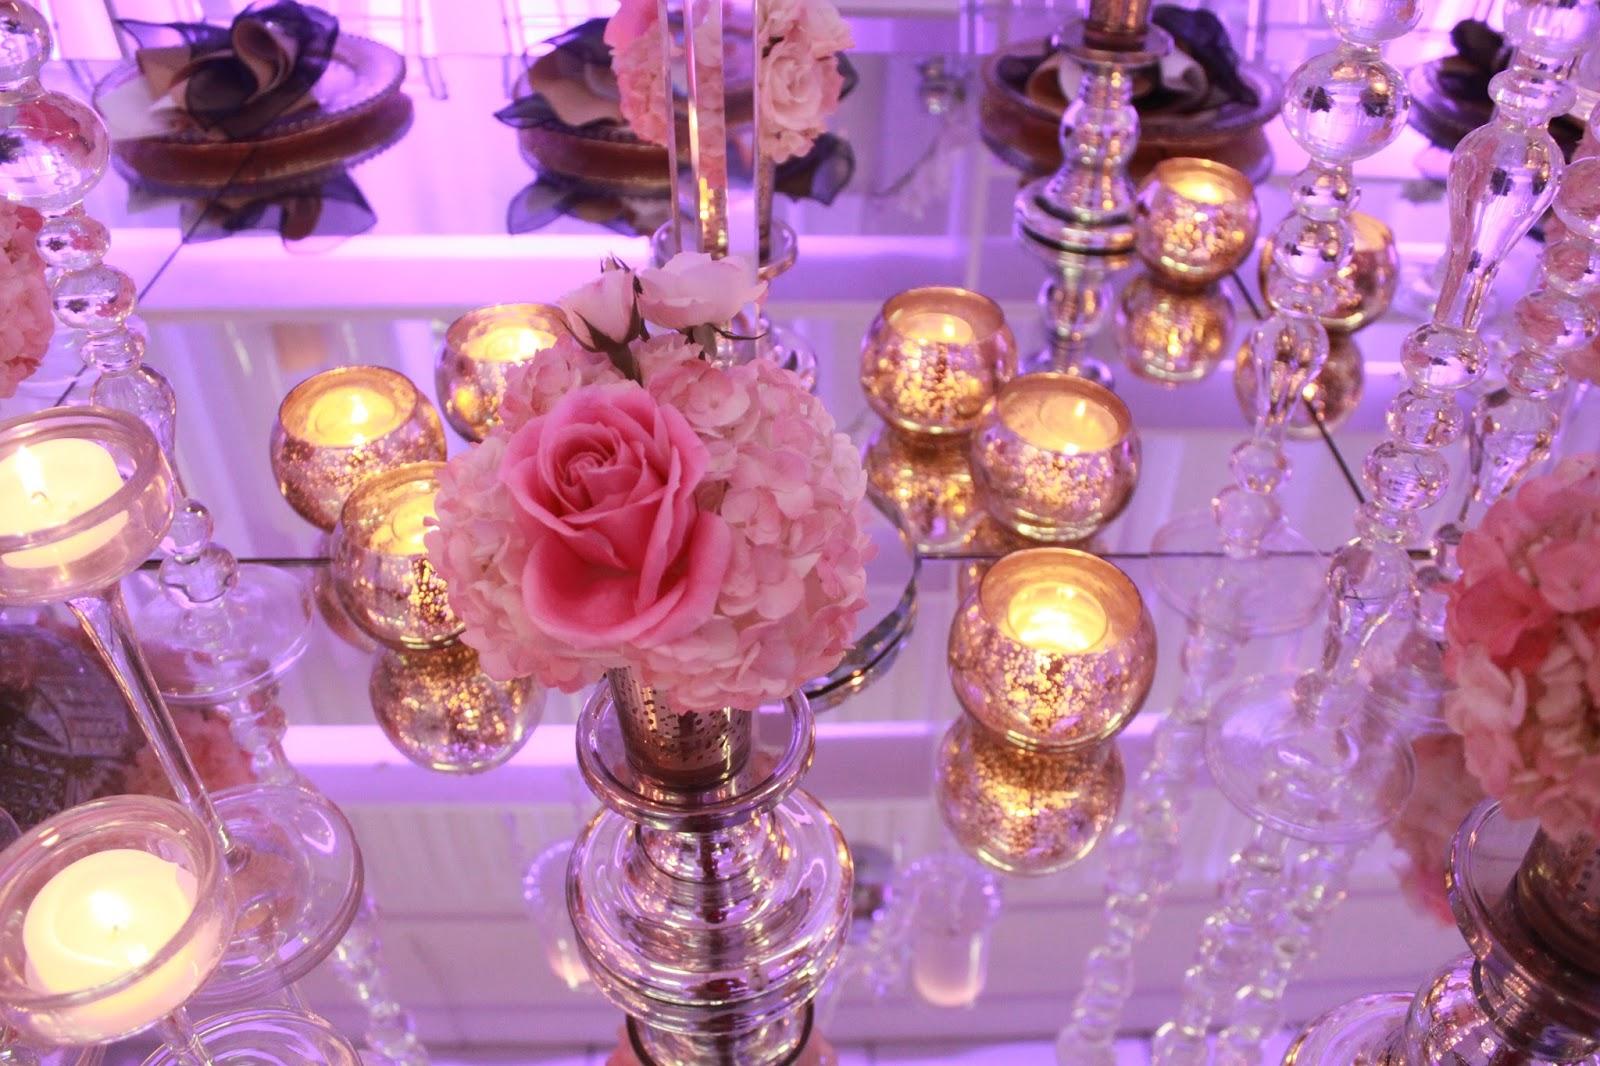 weddings florist washington dc - www.davinciflorist.us